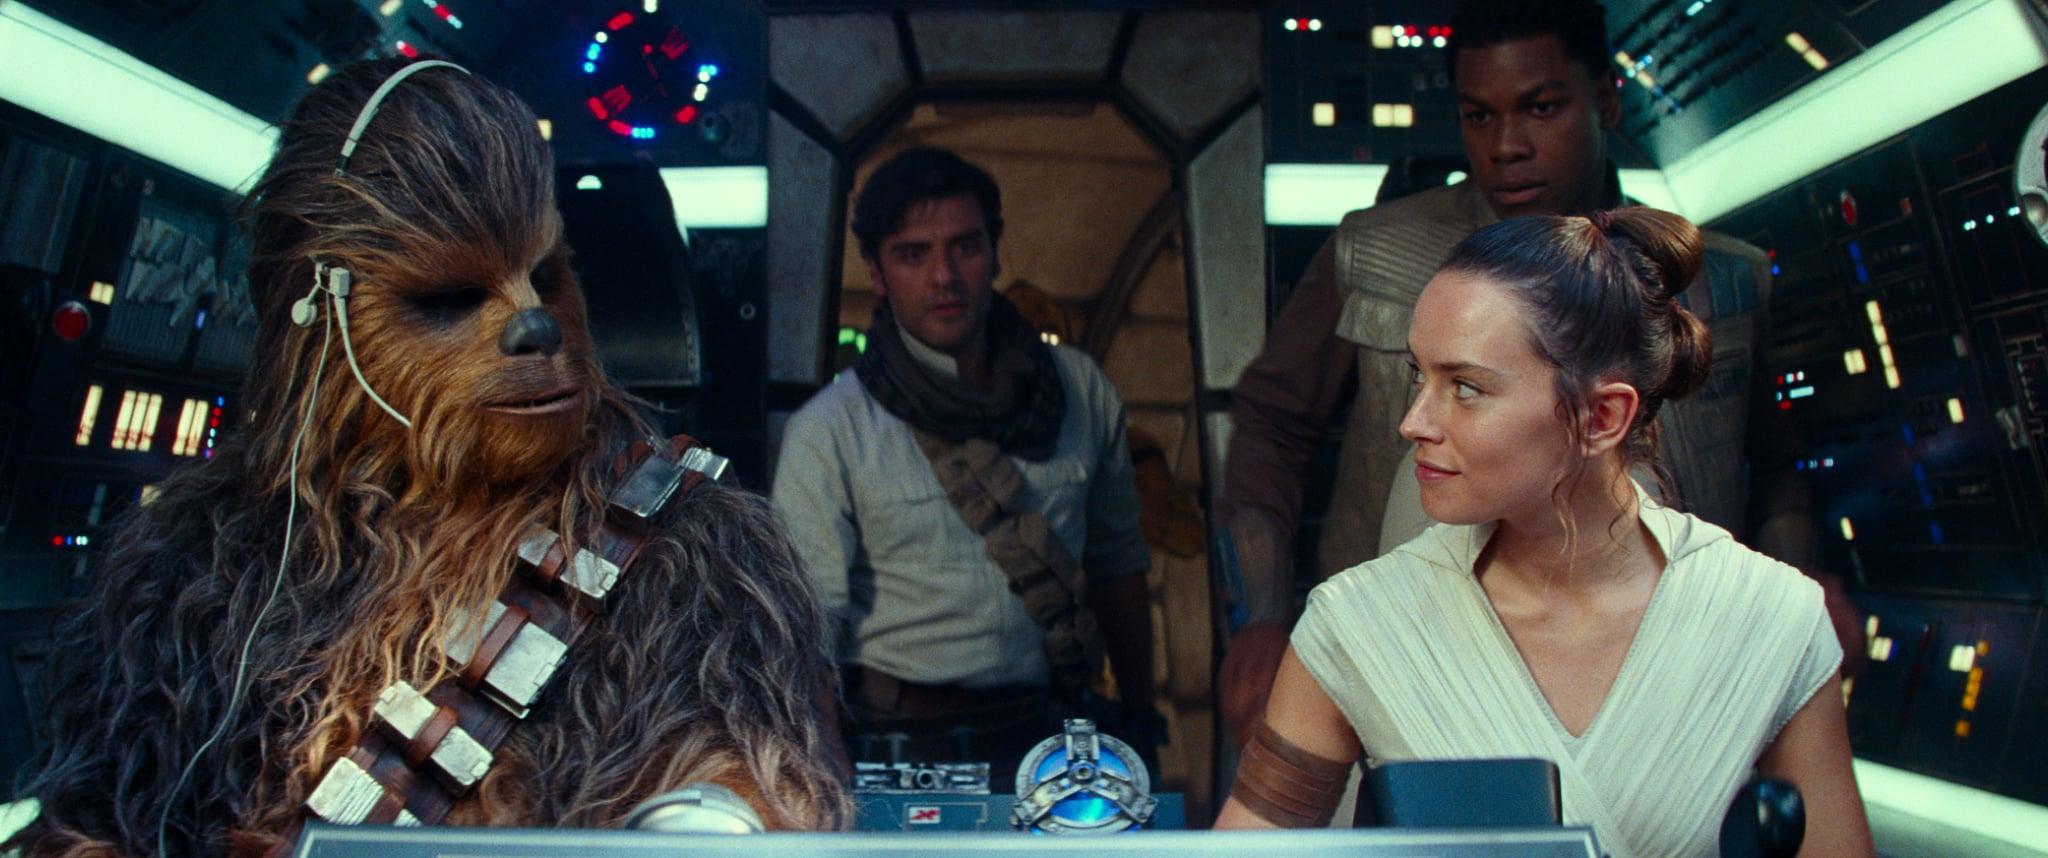 Joonas Suotamo is Chewbacca, Oscar Isaac is Poe Dameron, Daisy Ridley is Rey and John Boyega is Finn in STAR WARS:  THE RISE OF SKYWALKER